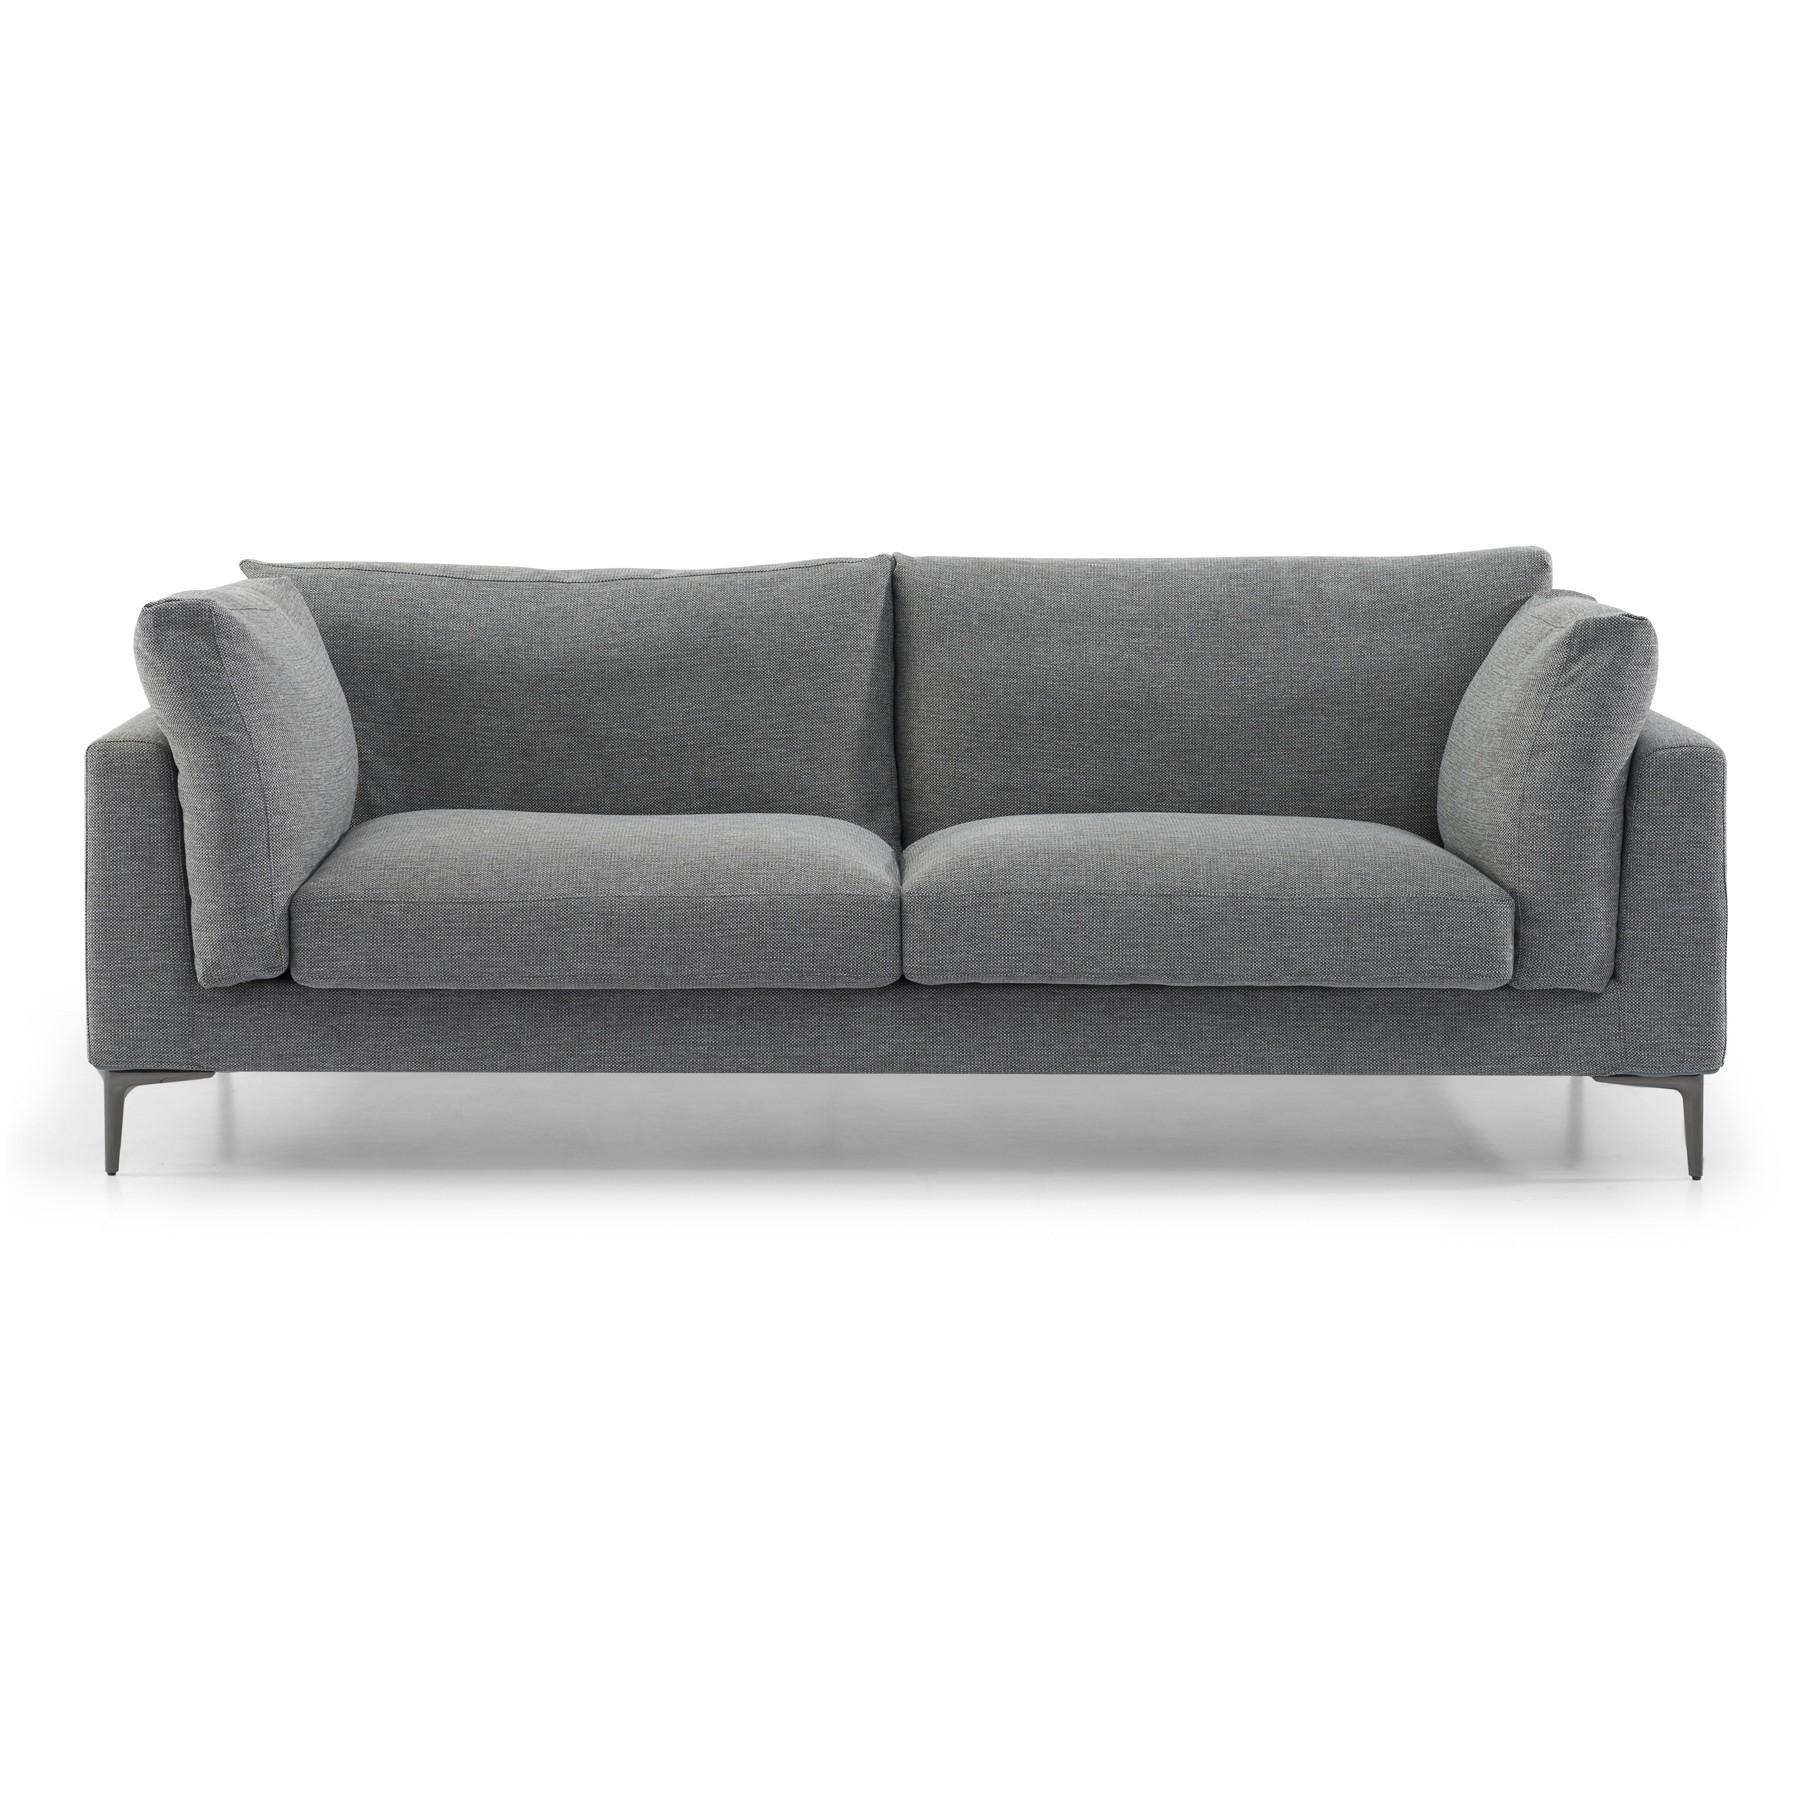 Romney Fabric Sofa, 3 Seater, Graphite Grey